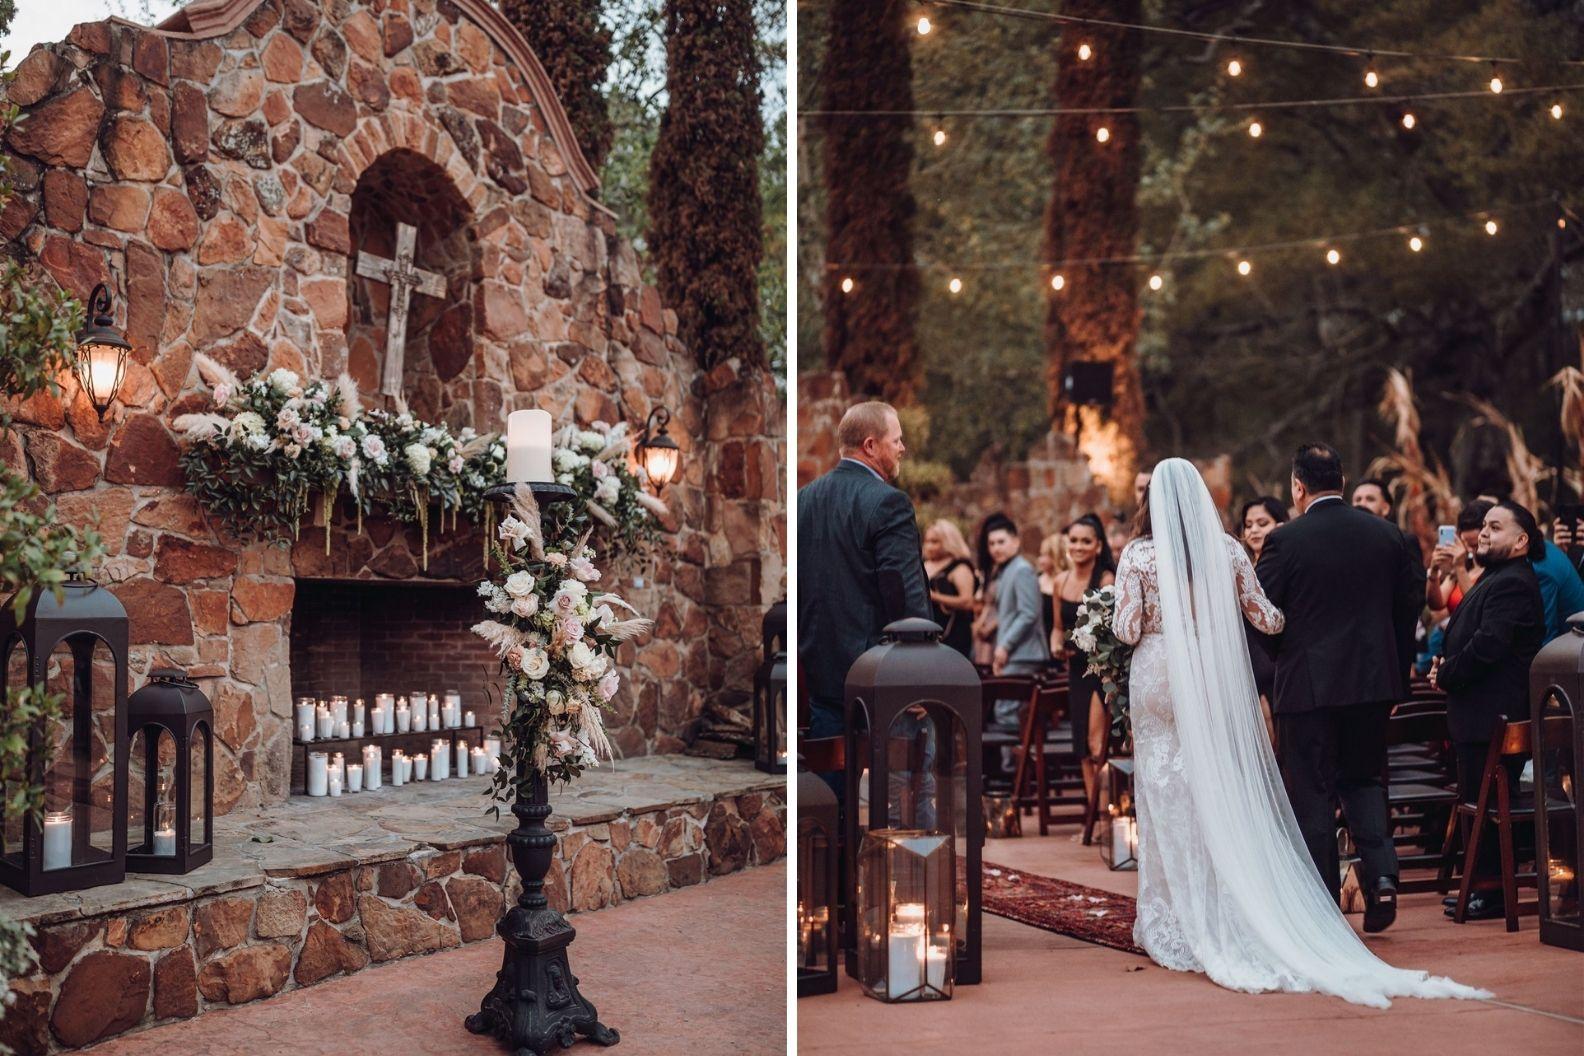 14 Samantha and Mario - Madera Estates Conroe Texas - Twilight Evening Outdoor Ceremony